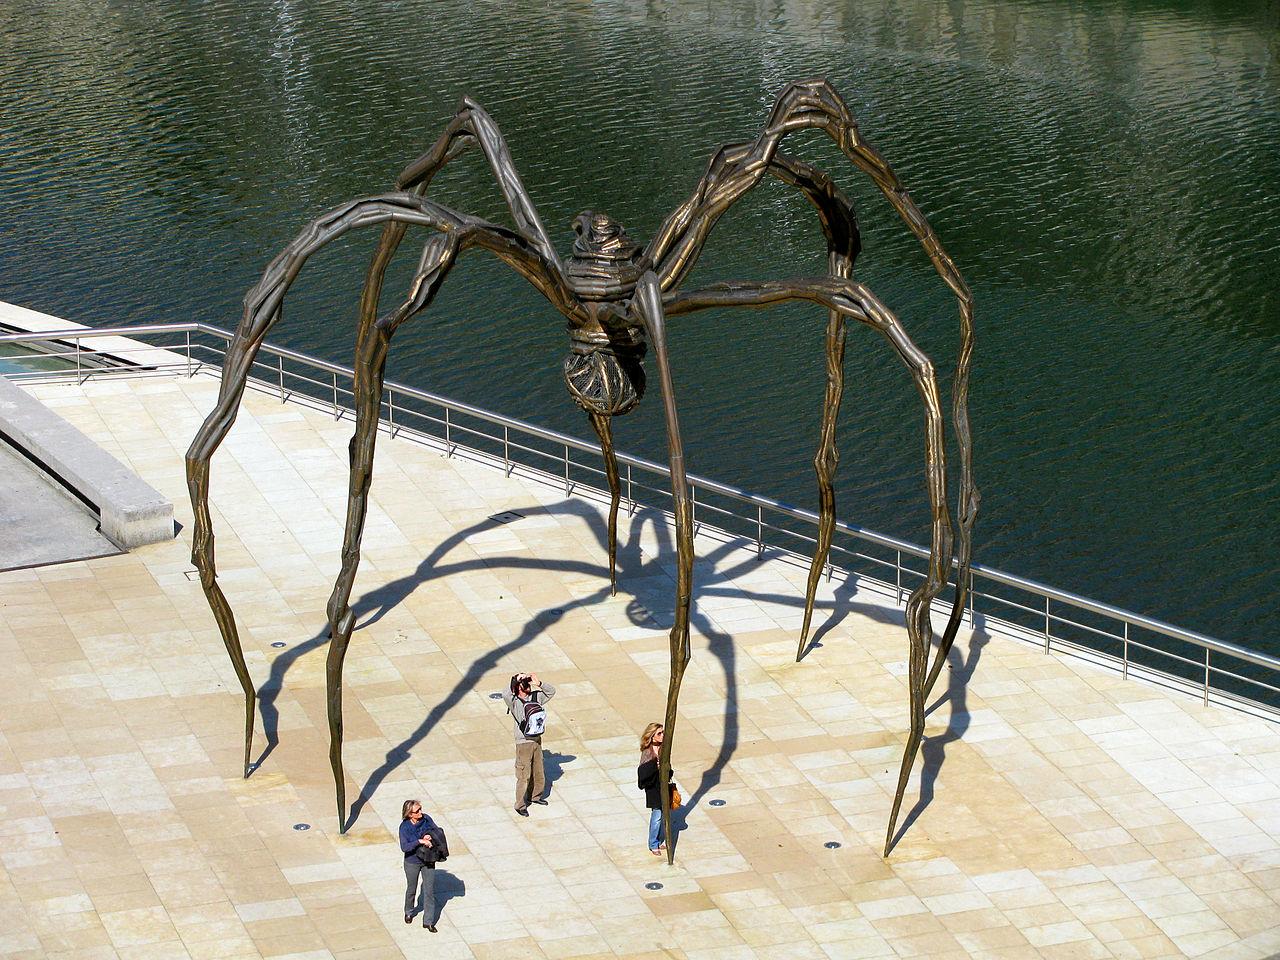 Музей Гуггенхайма в Бильбао, скульптура паука